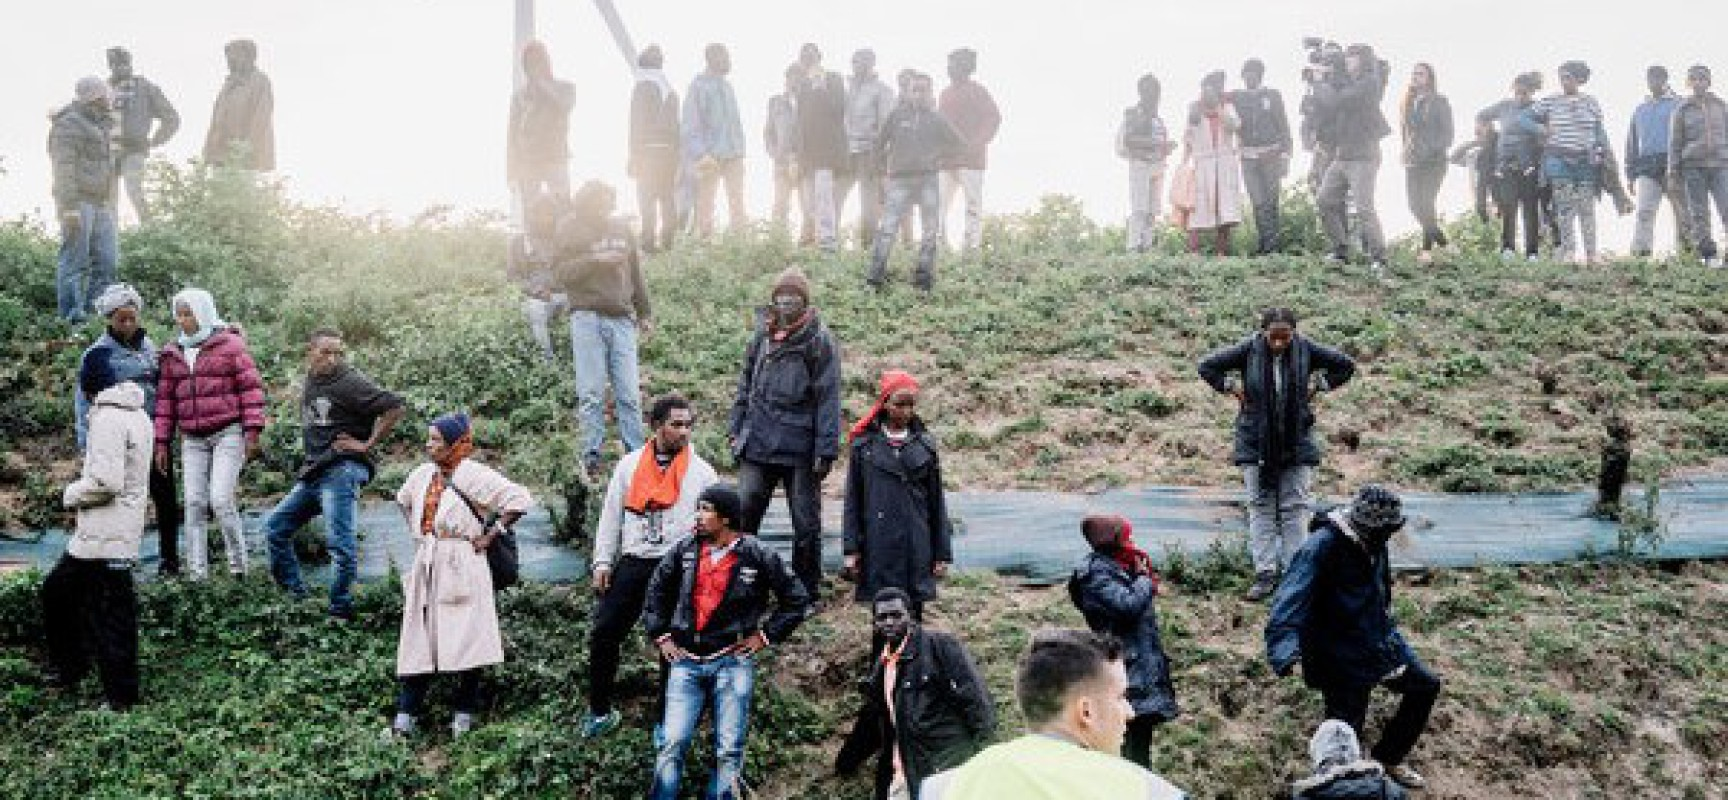 Les migrants de Calais : une énigme